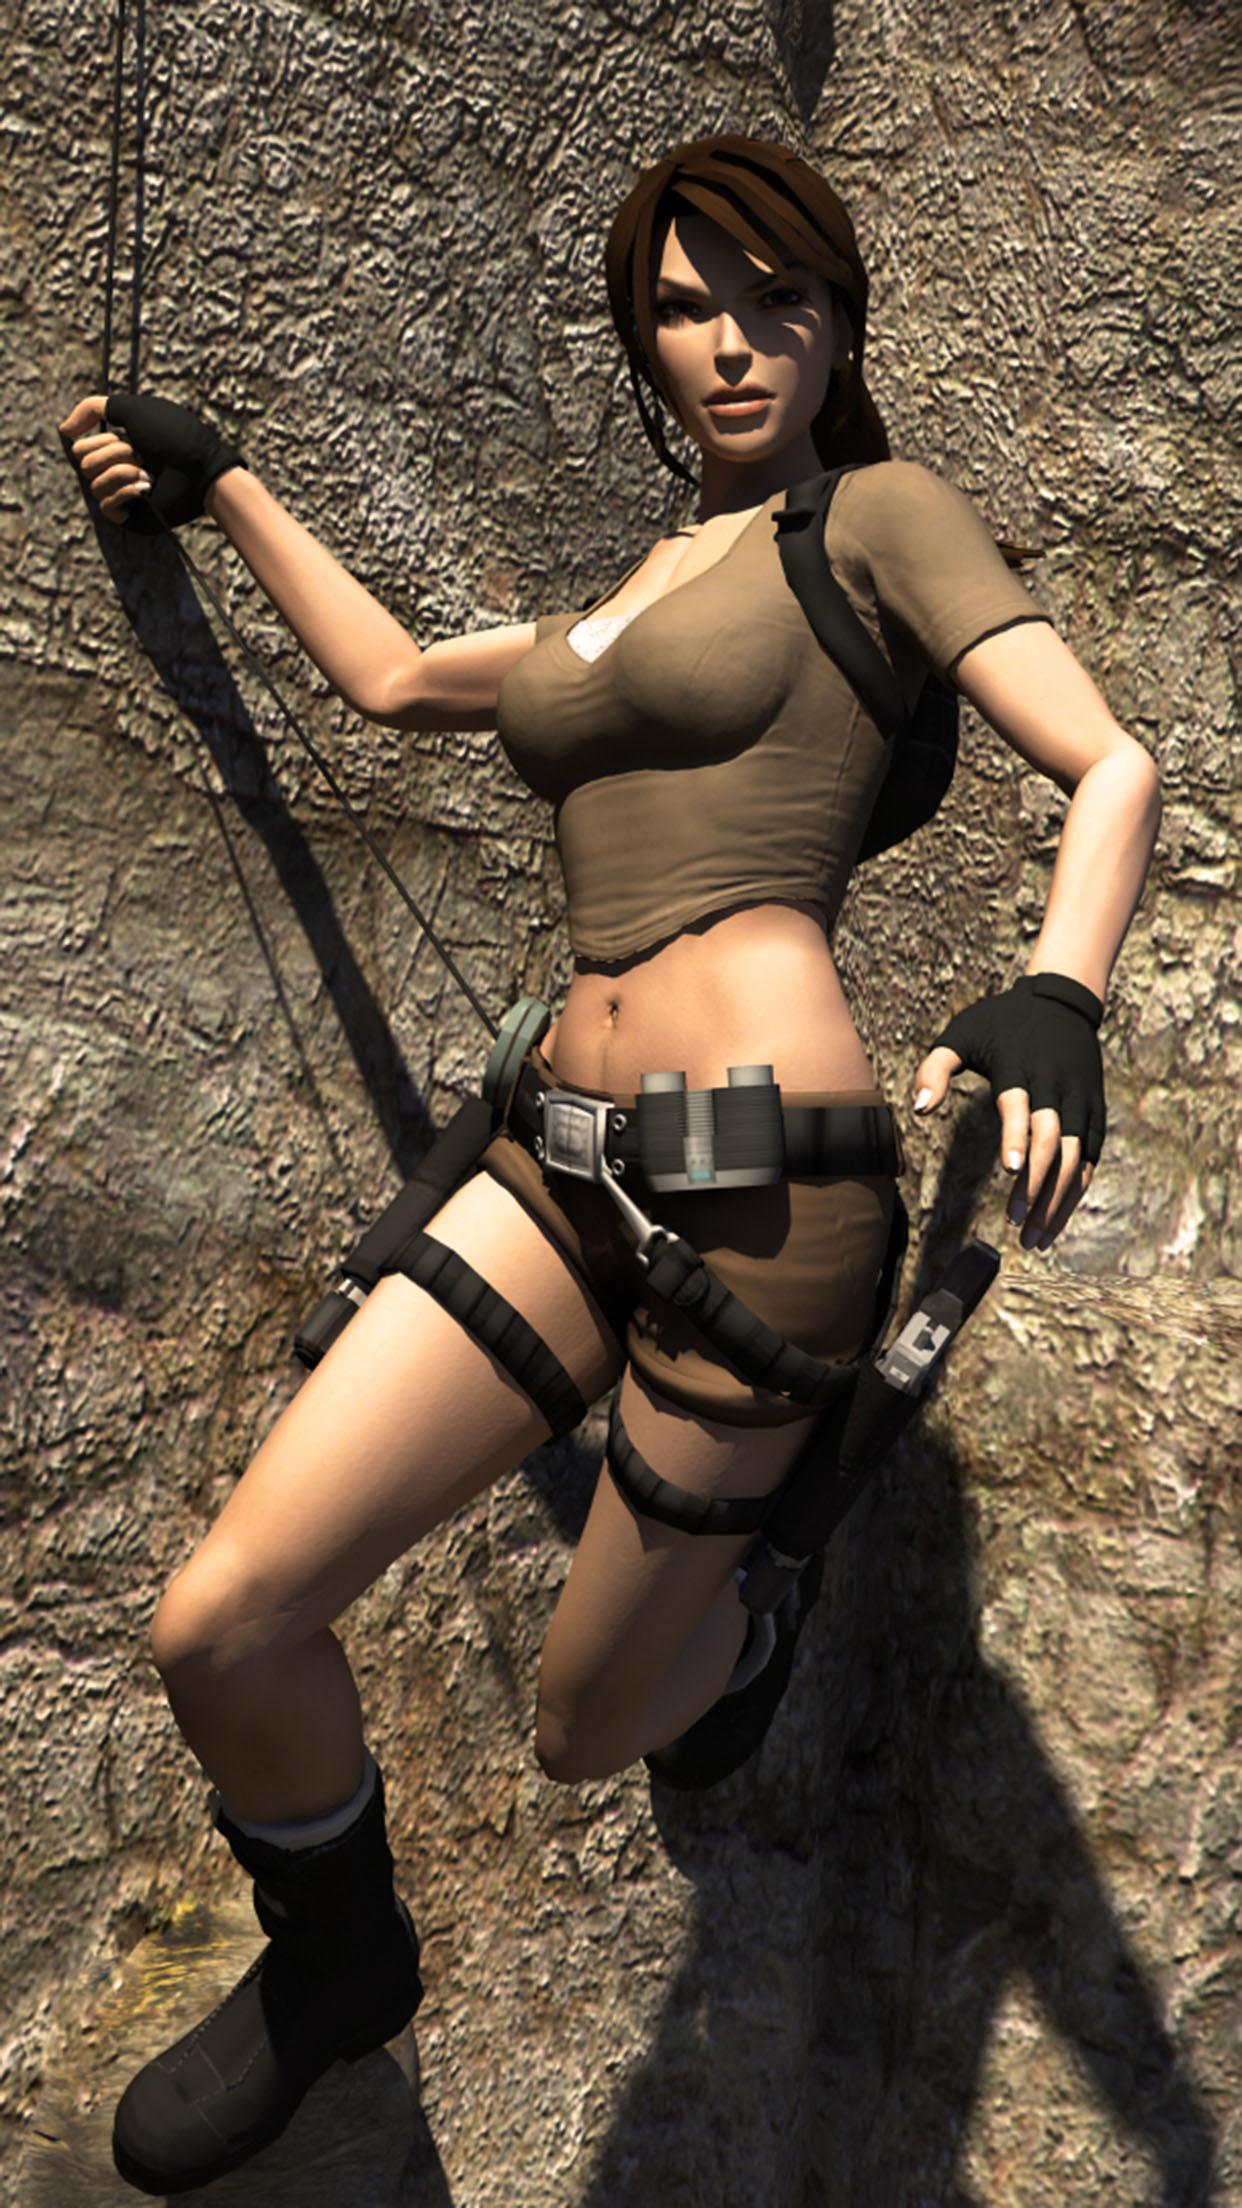 Tomb Raider Lara Croft 3Wallpapers iPhone Parallax Lara Croft